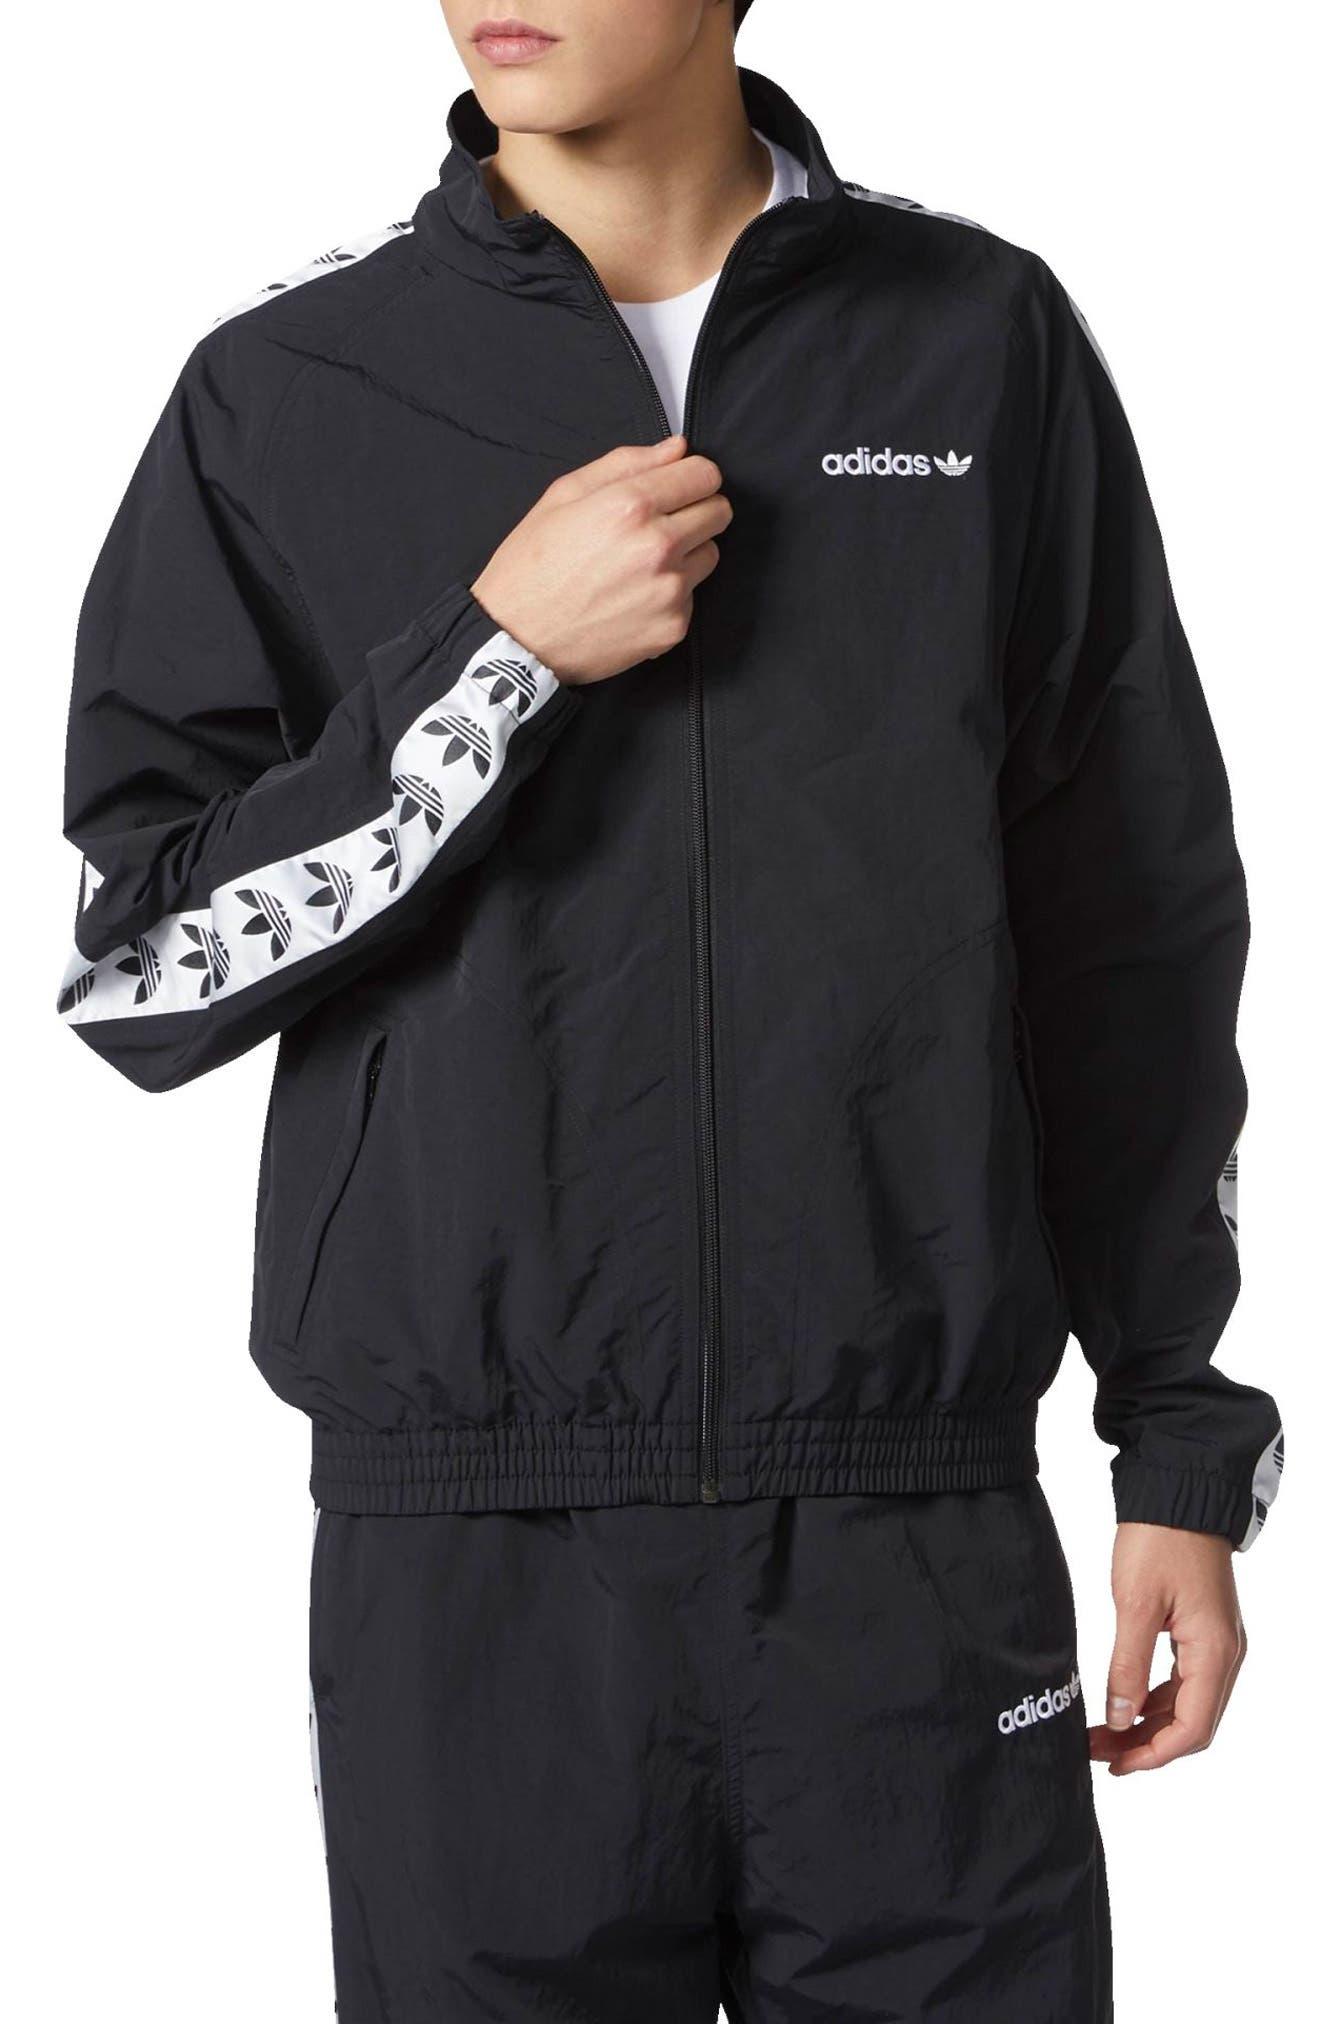 Alternate Image 1 Selected - adidas Originals TNT Tape Wind Jacket